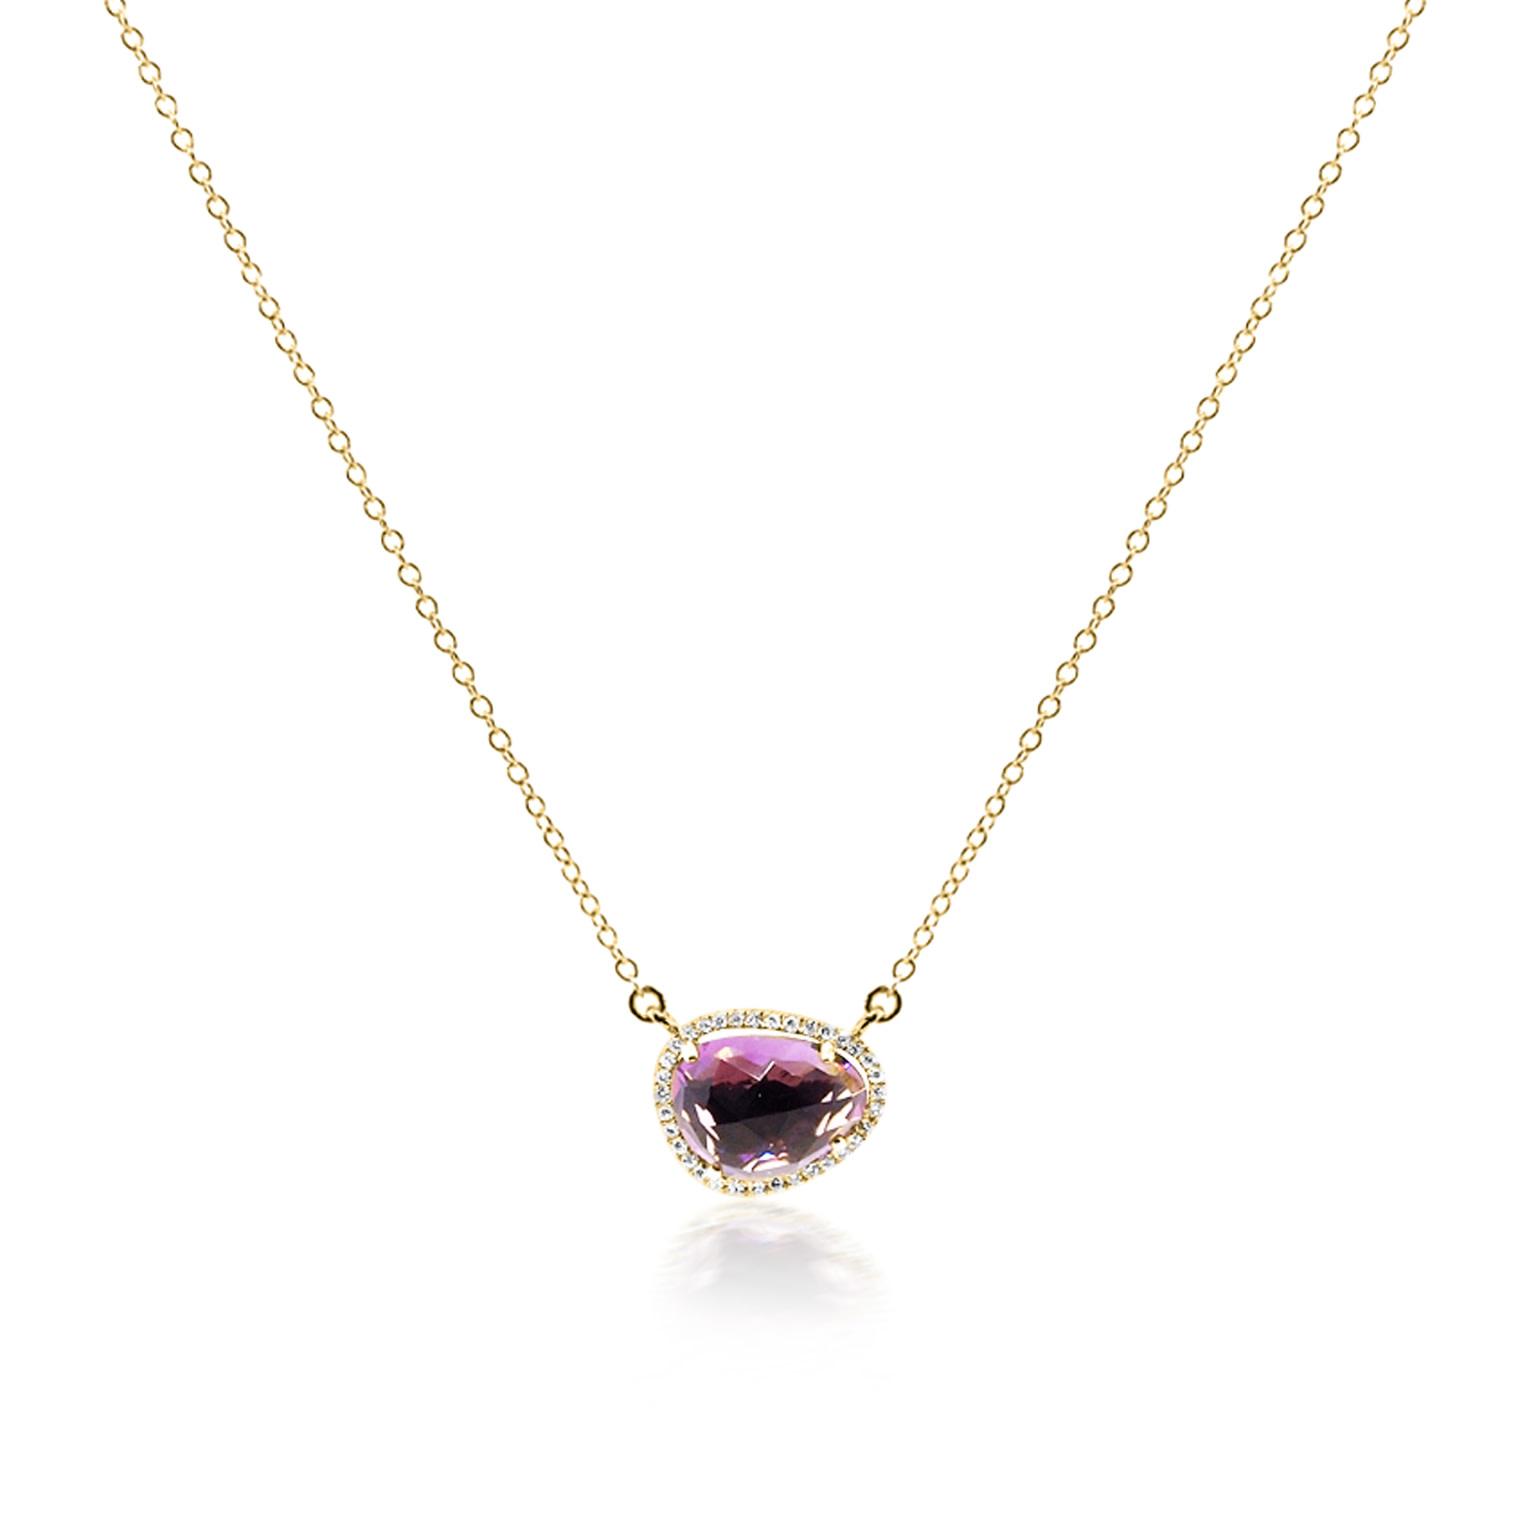 Asymmetrical Amethyst Necklace